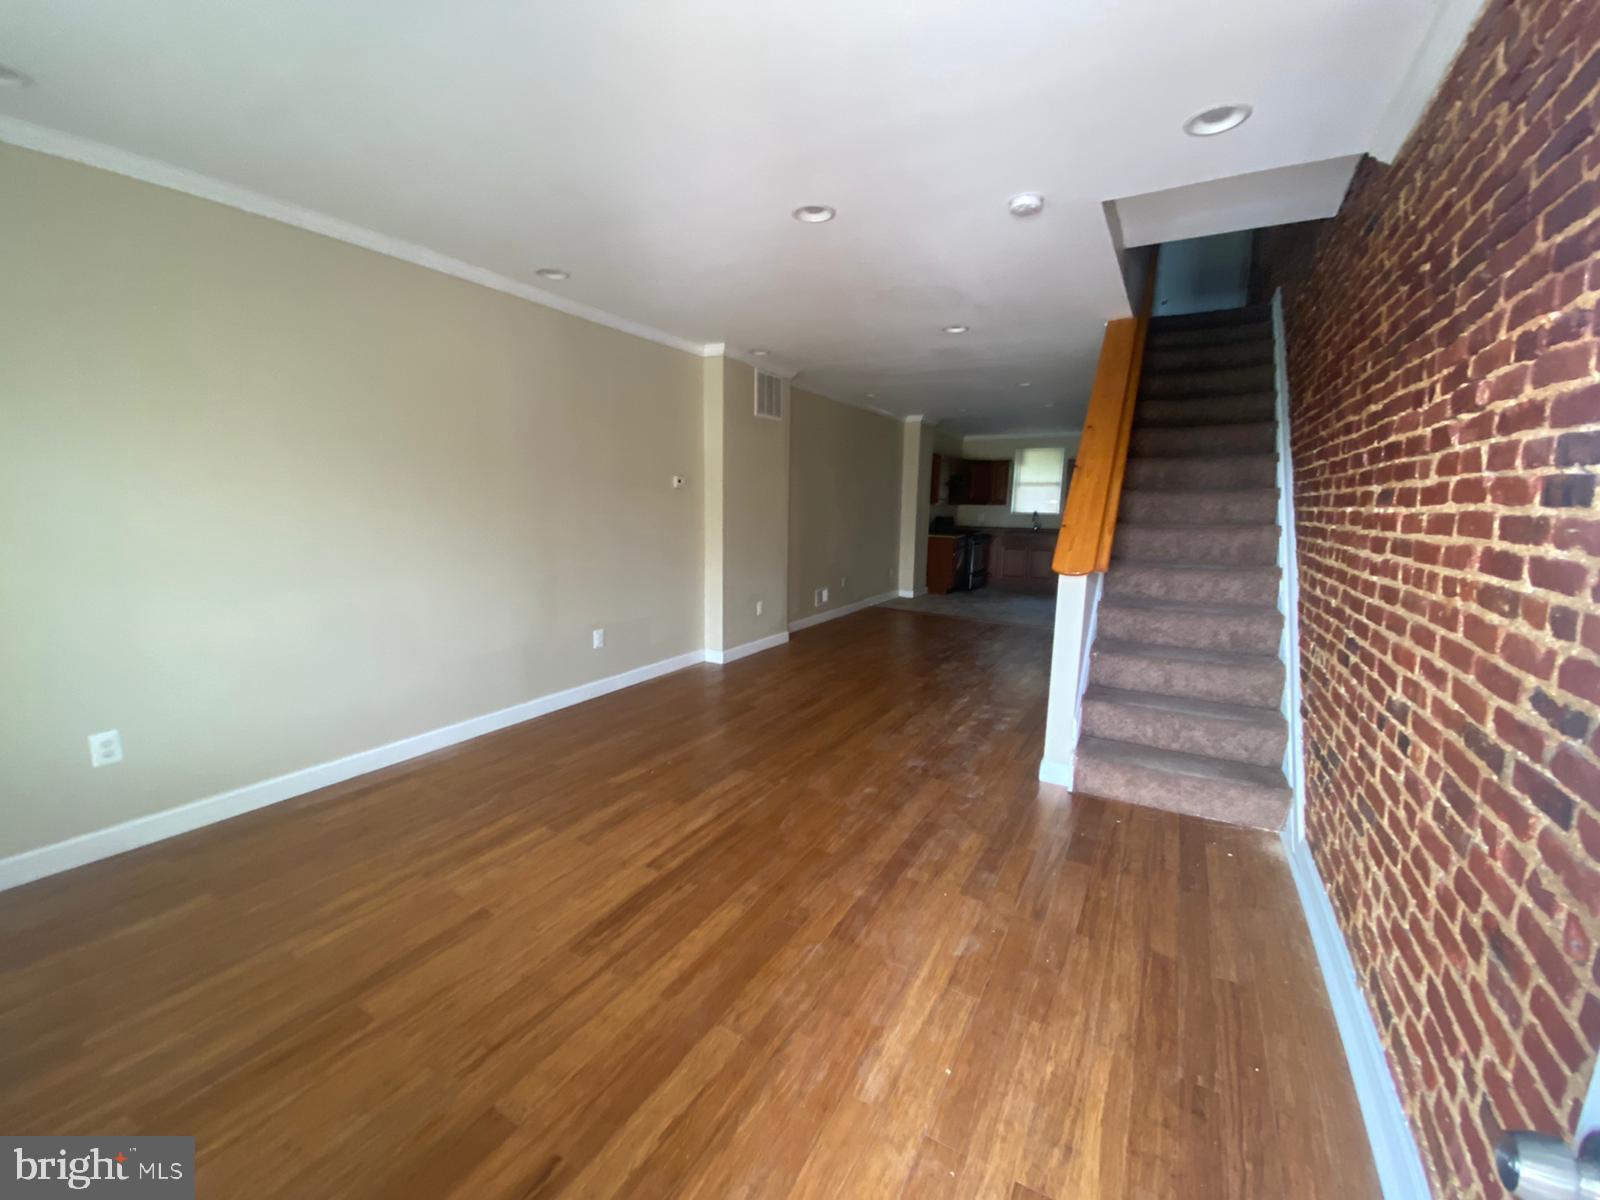 1720 E 28Th Street, Baltimore, MD 21218